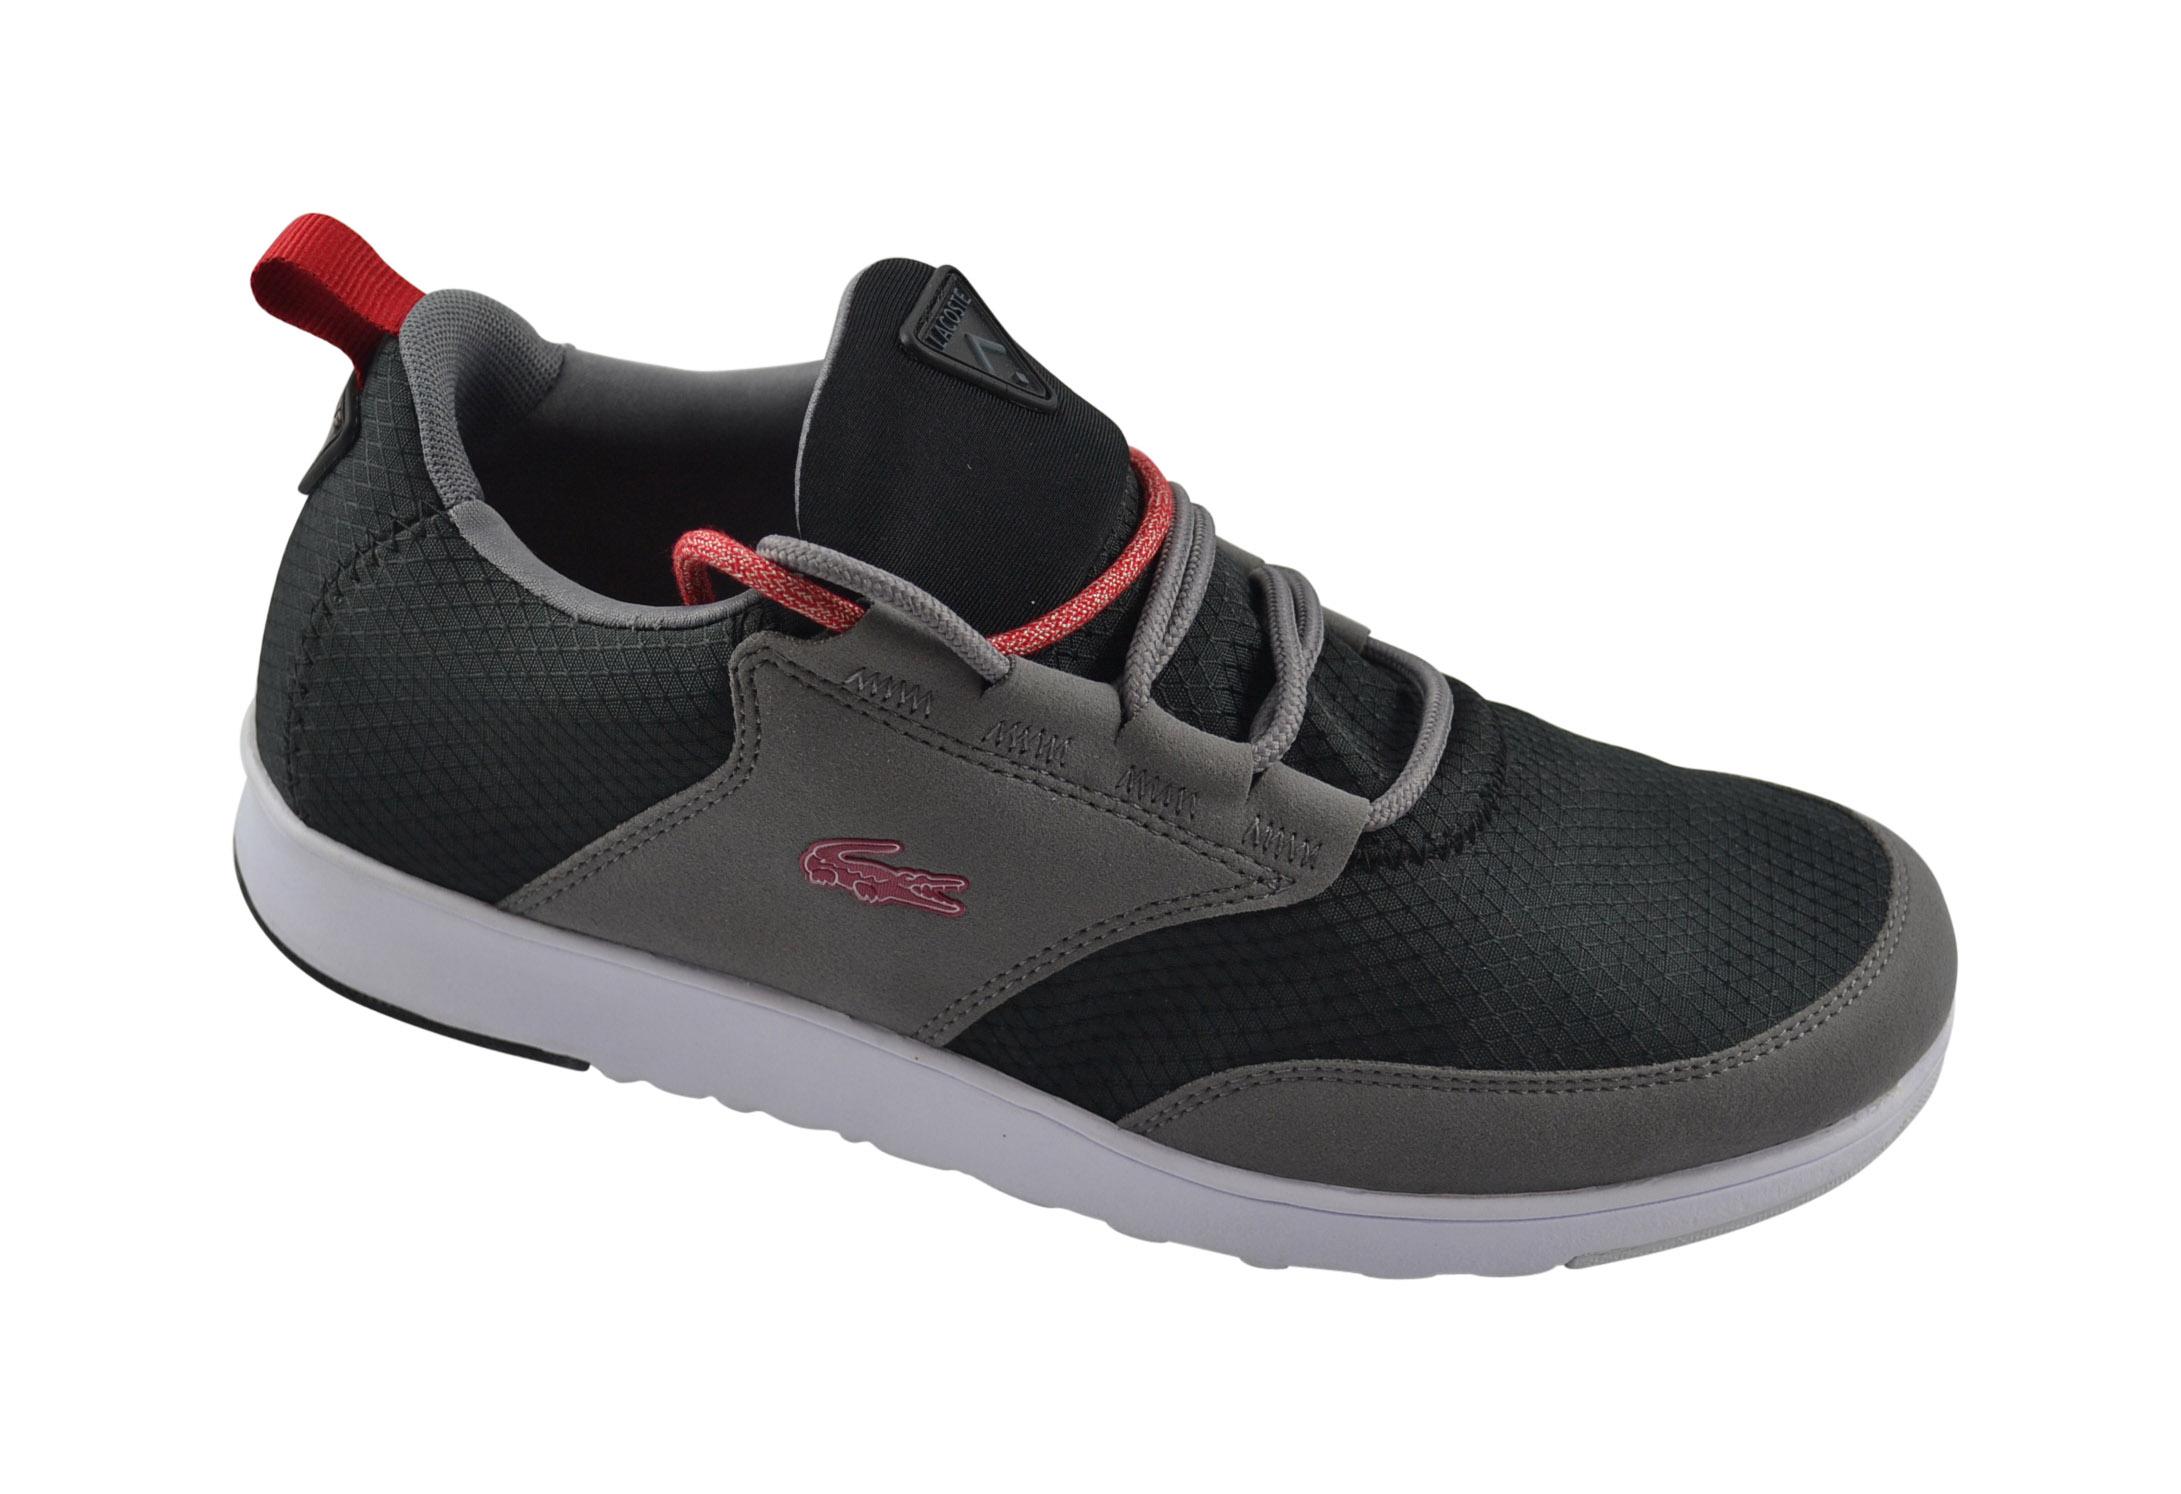 lacoste 01 com spm black dark grey schuhe light sneaker gr 41 sale ebay. Black Bedroom Furniture Sets. Home Design Ideas